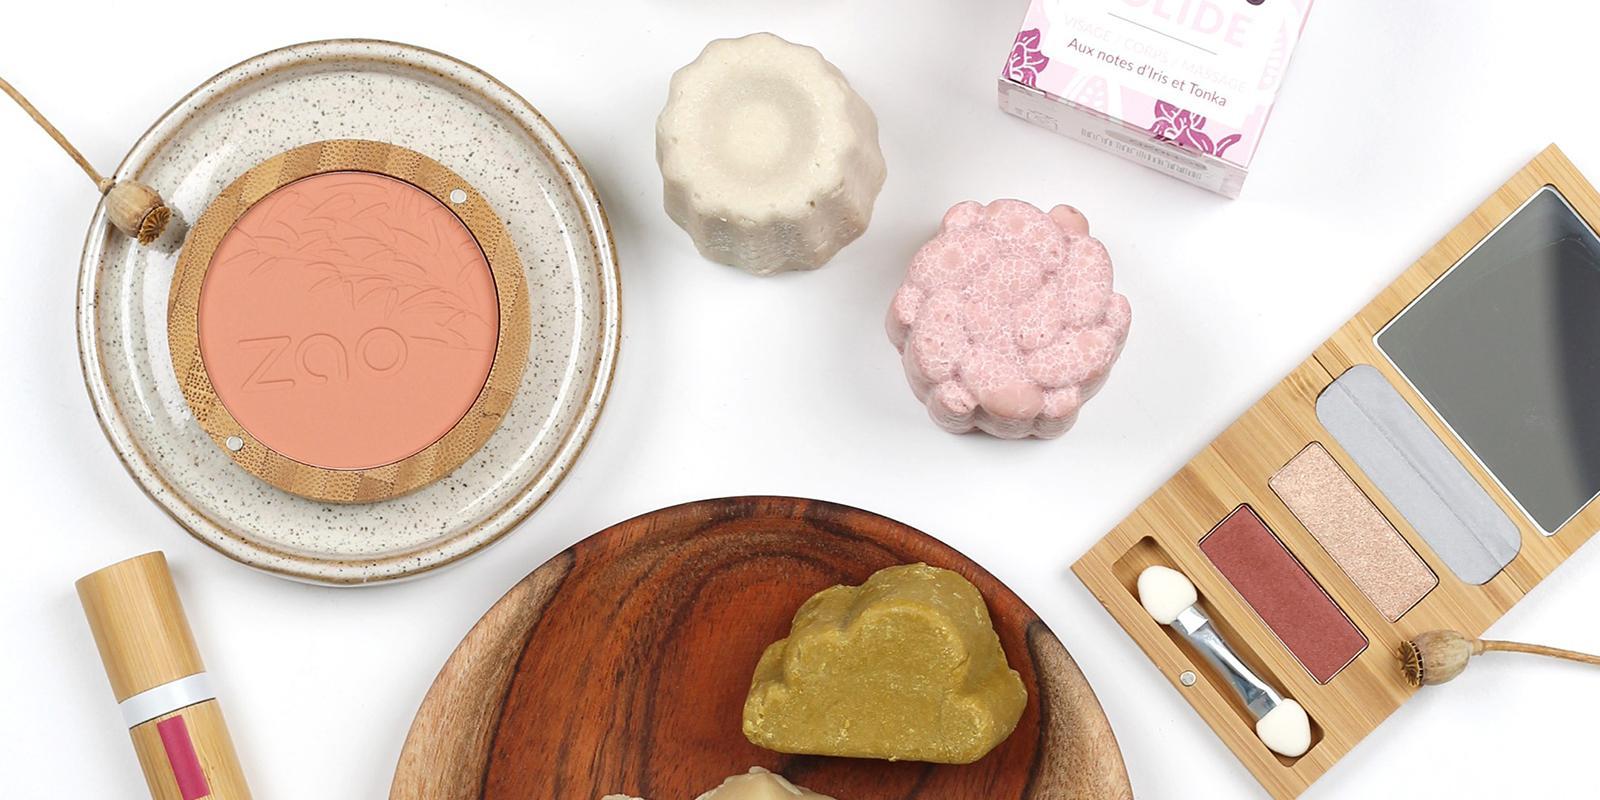 Kosmetika Lamazuna koláž